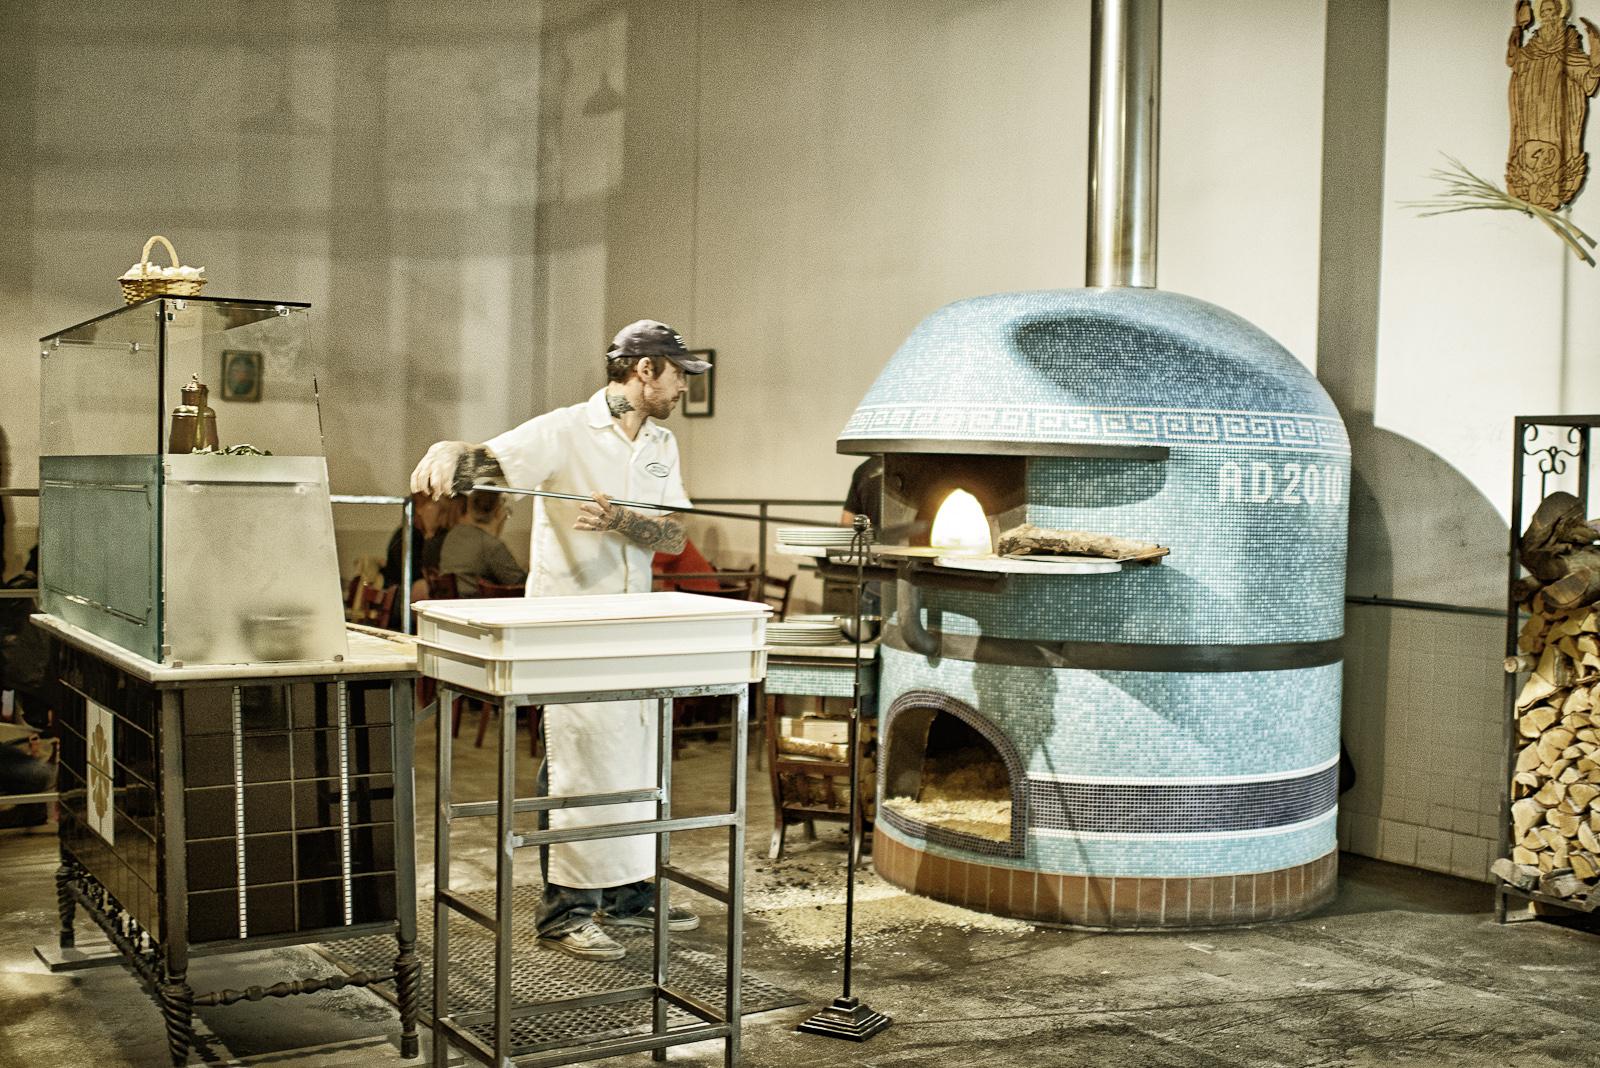 Pizzaiolo Anthony Mangieri